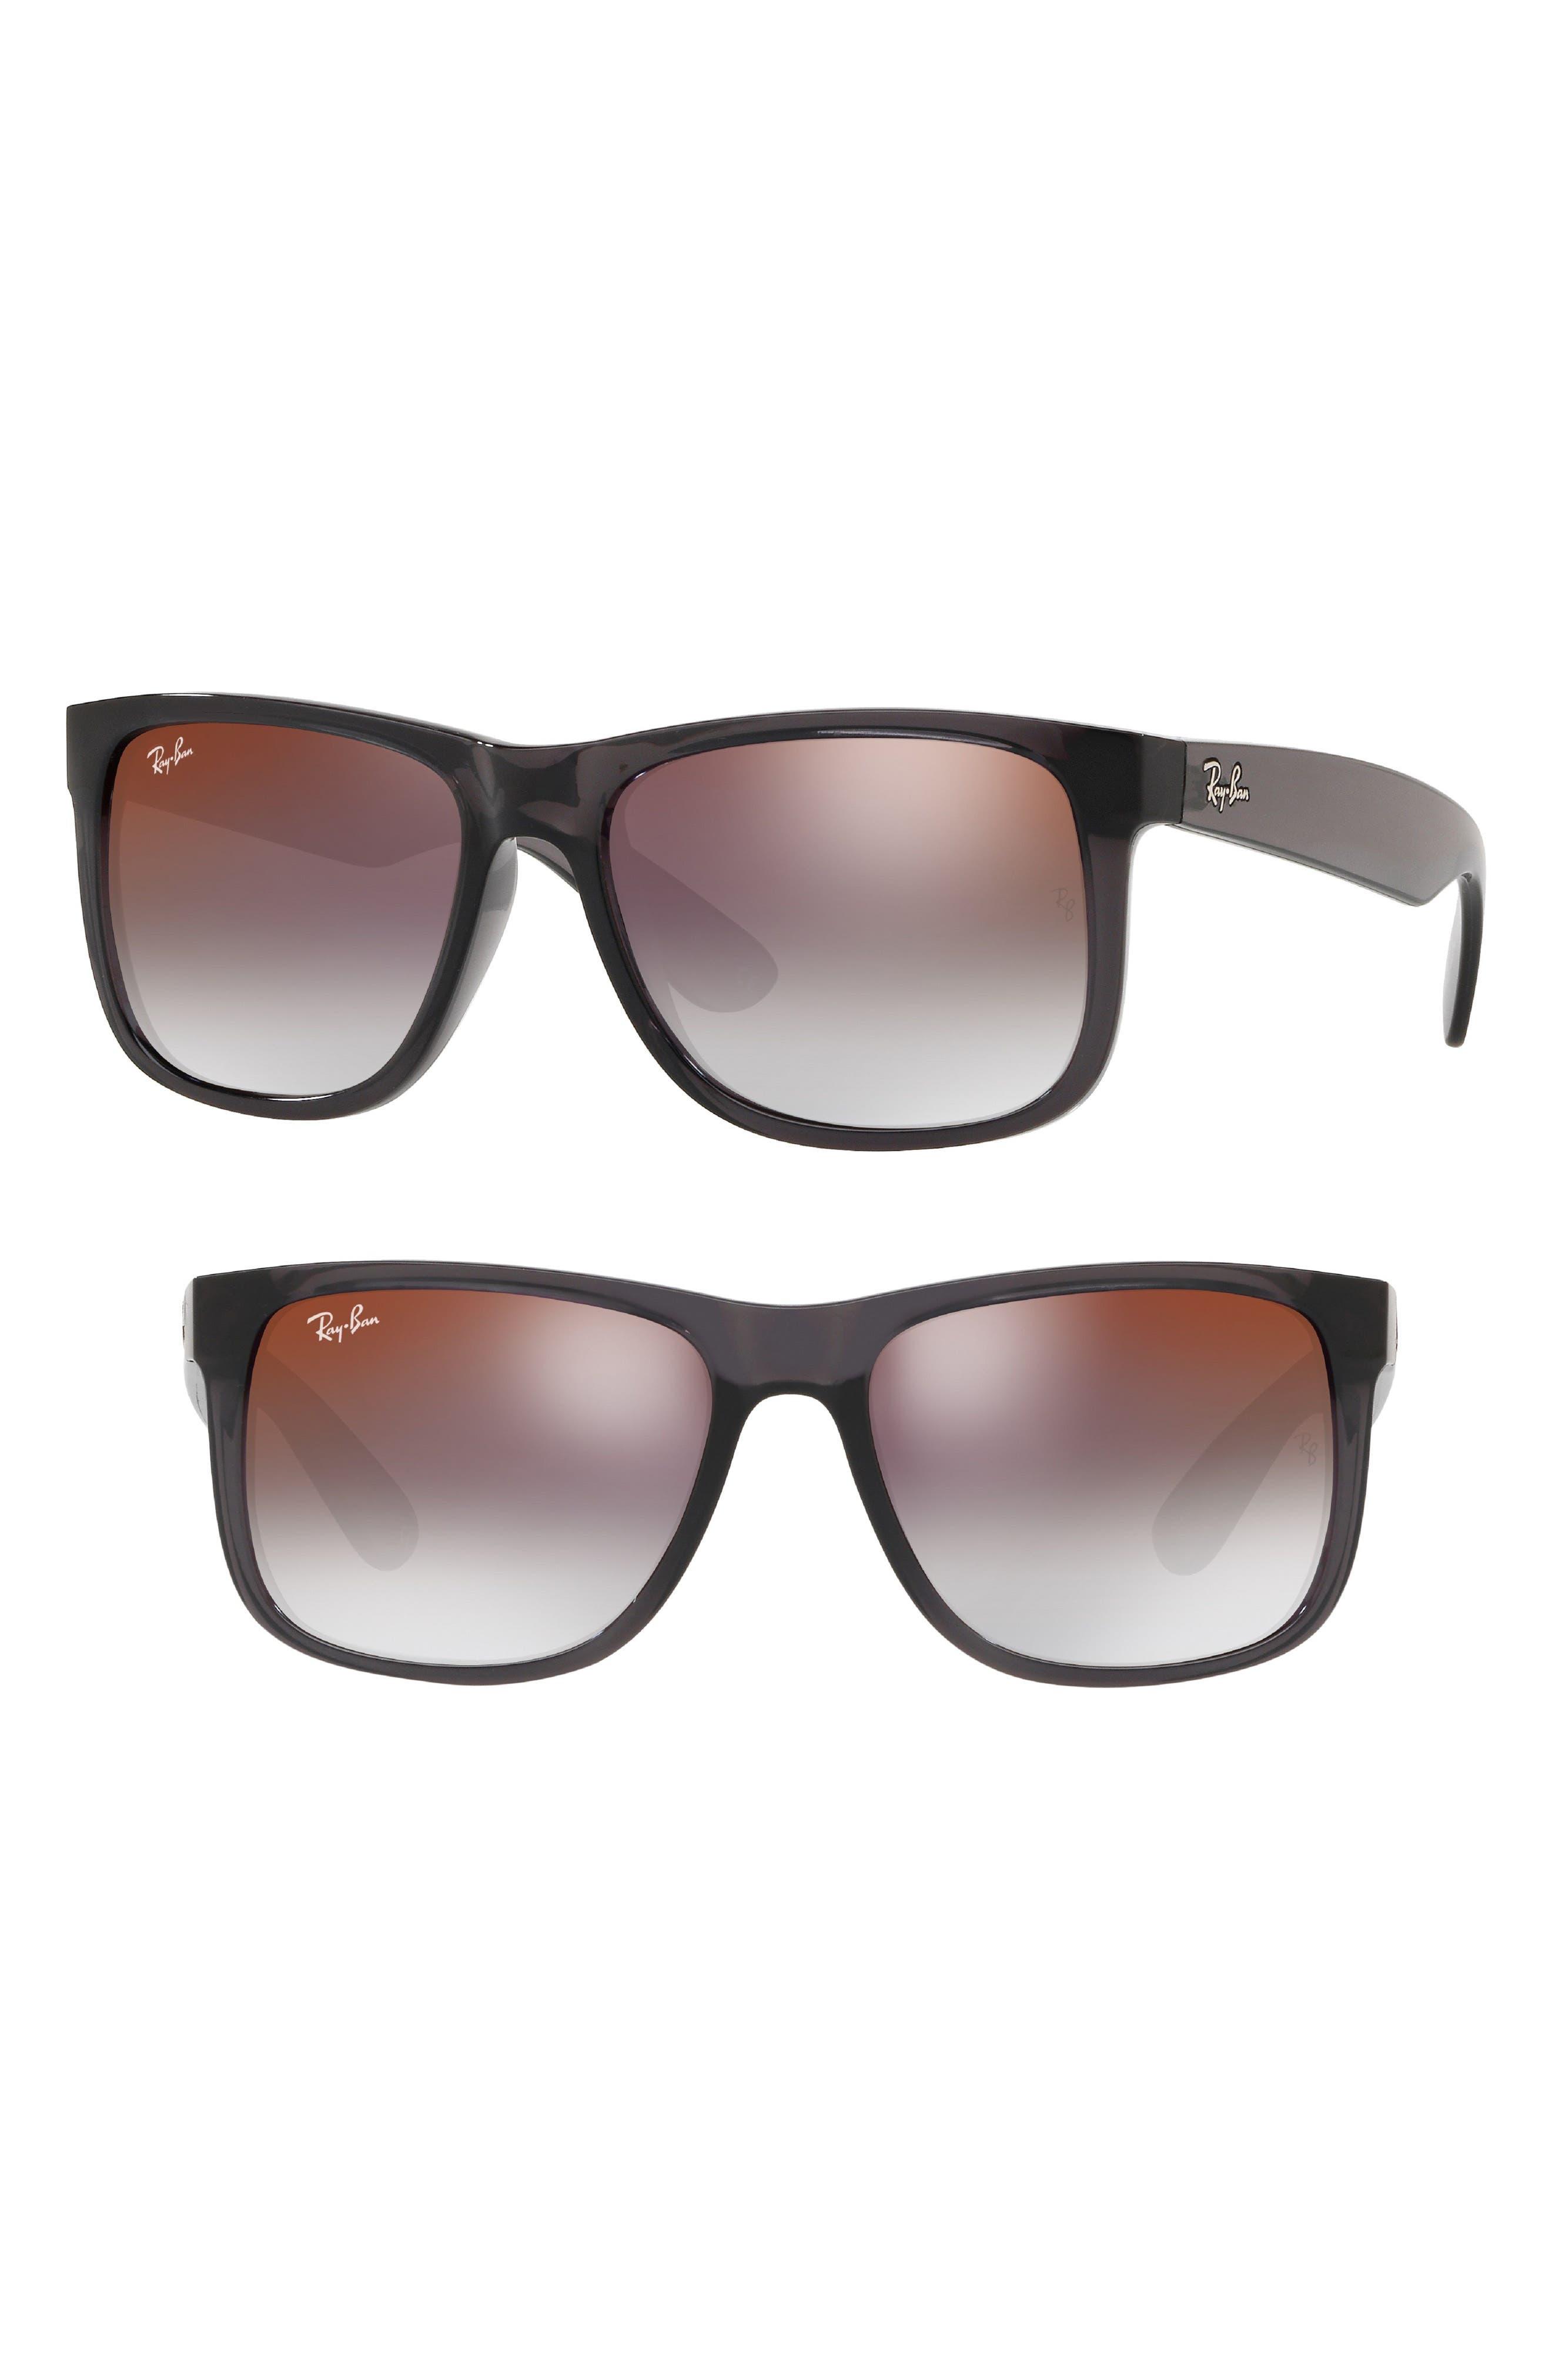 Justin 54mm Sunglasses,                         Main,                         color, 020